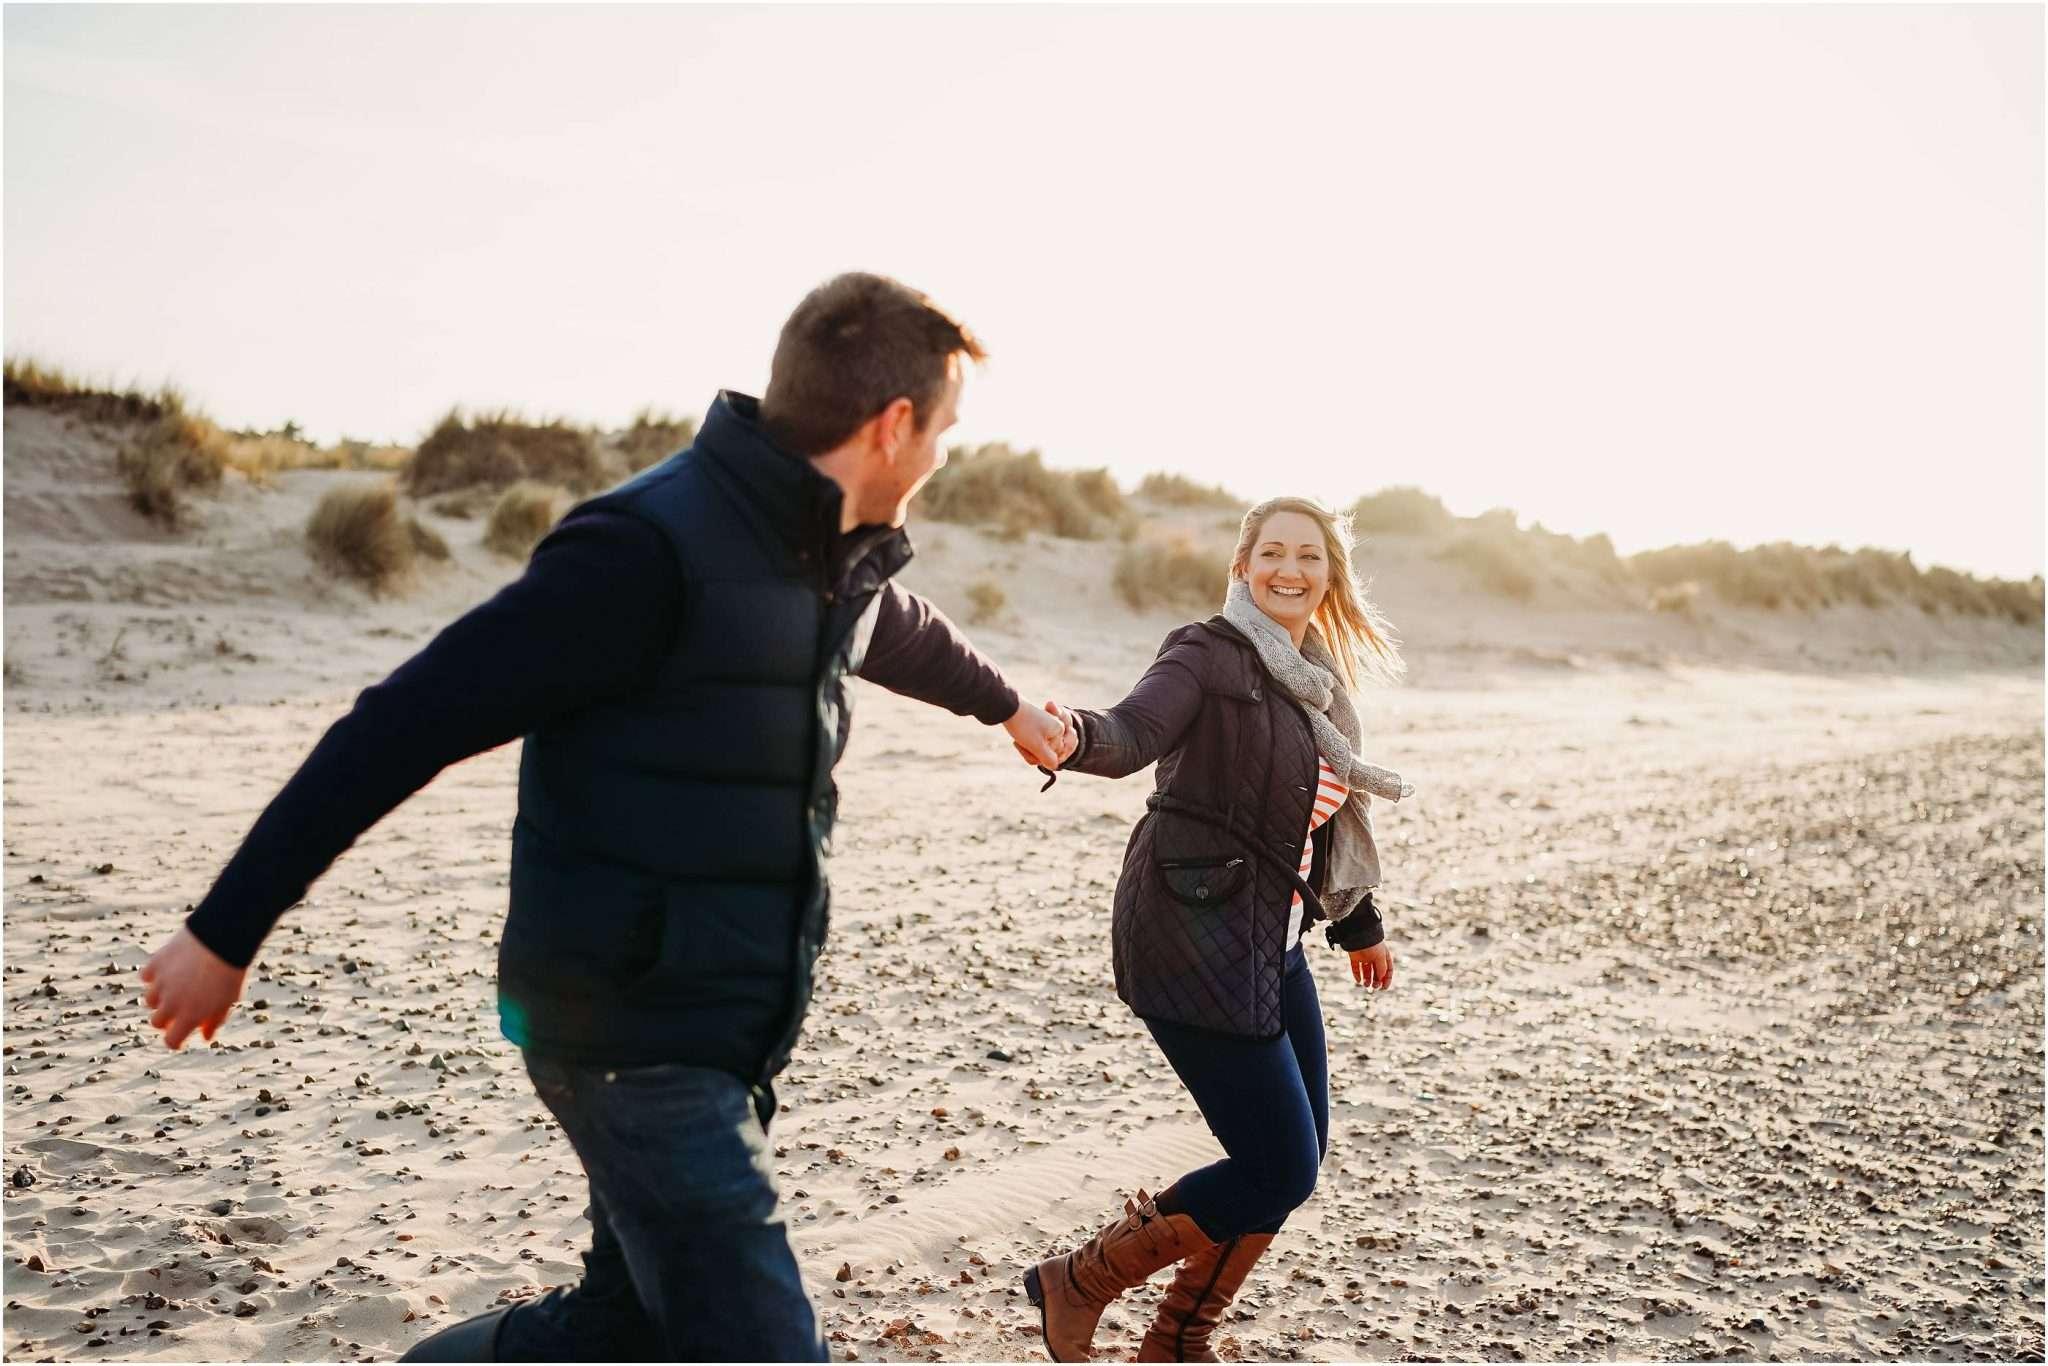 KAT & COLM ENGAGEMENT SHOOT - NORFOLK WEDDING PHOTOGRAPHER 1